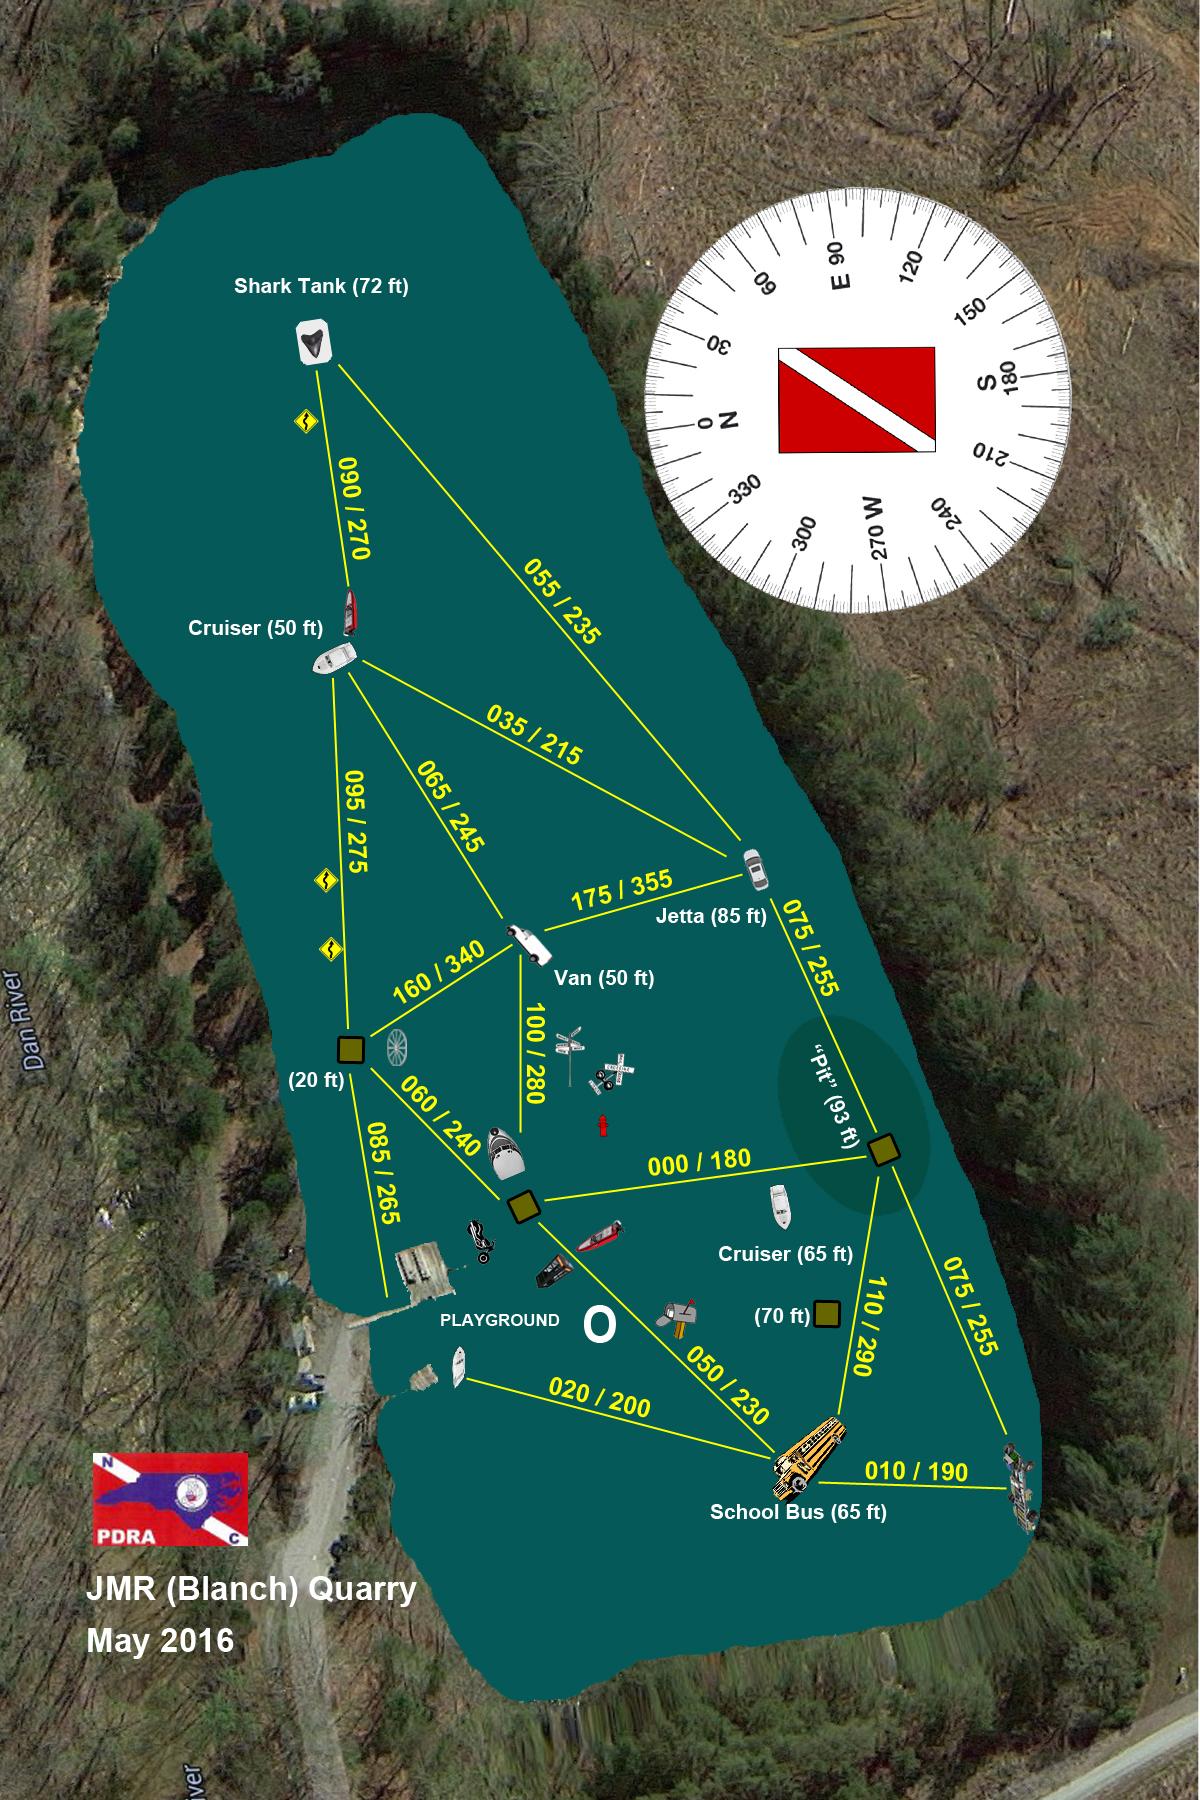 jmr-quarry-map